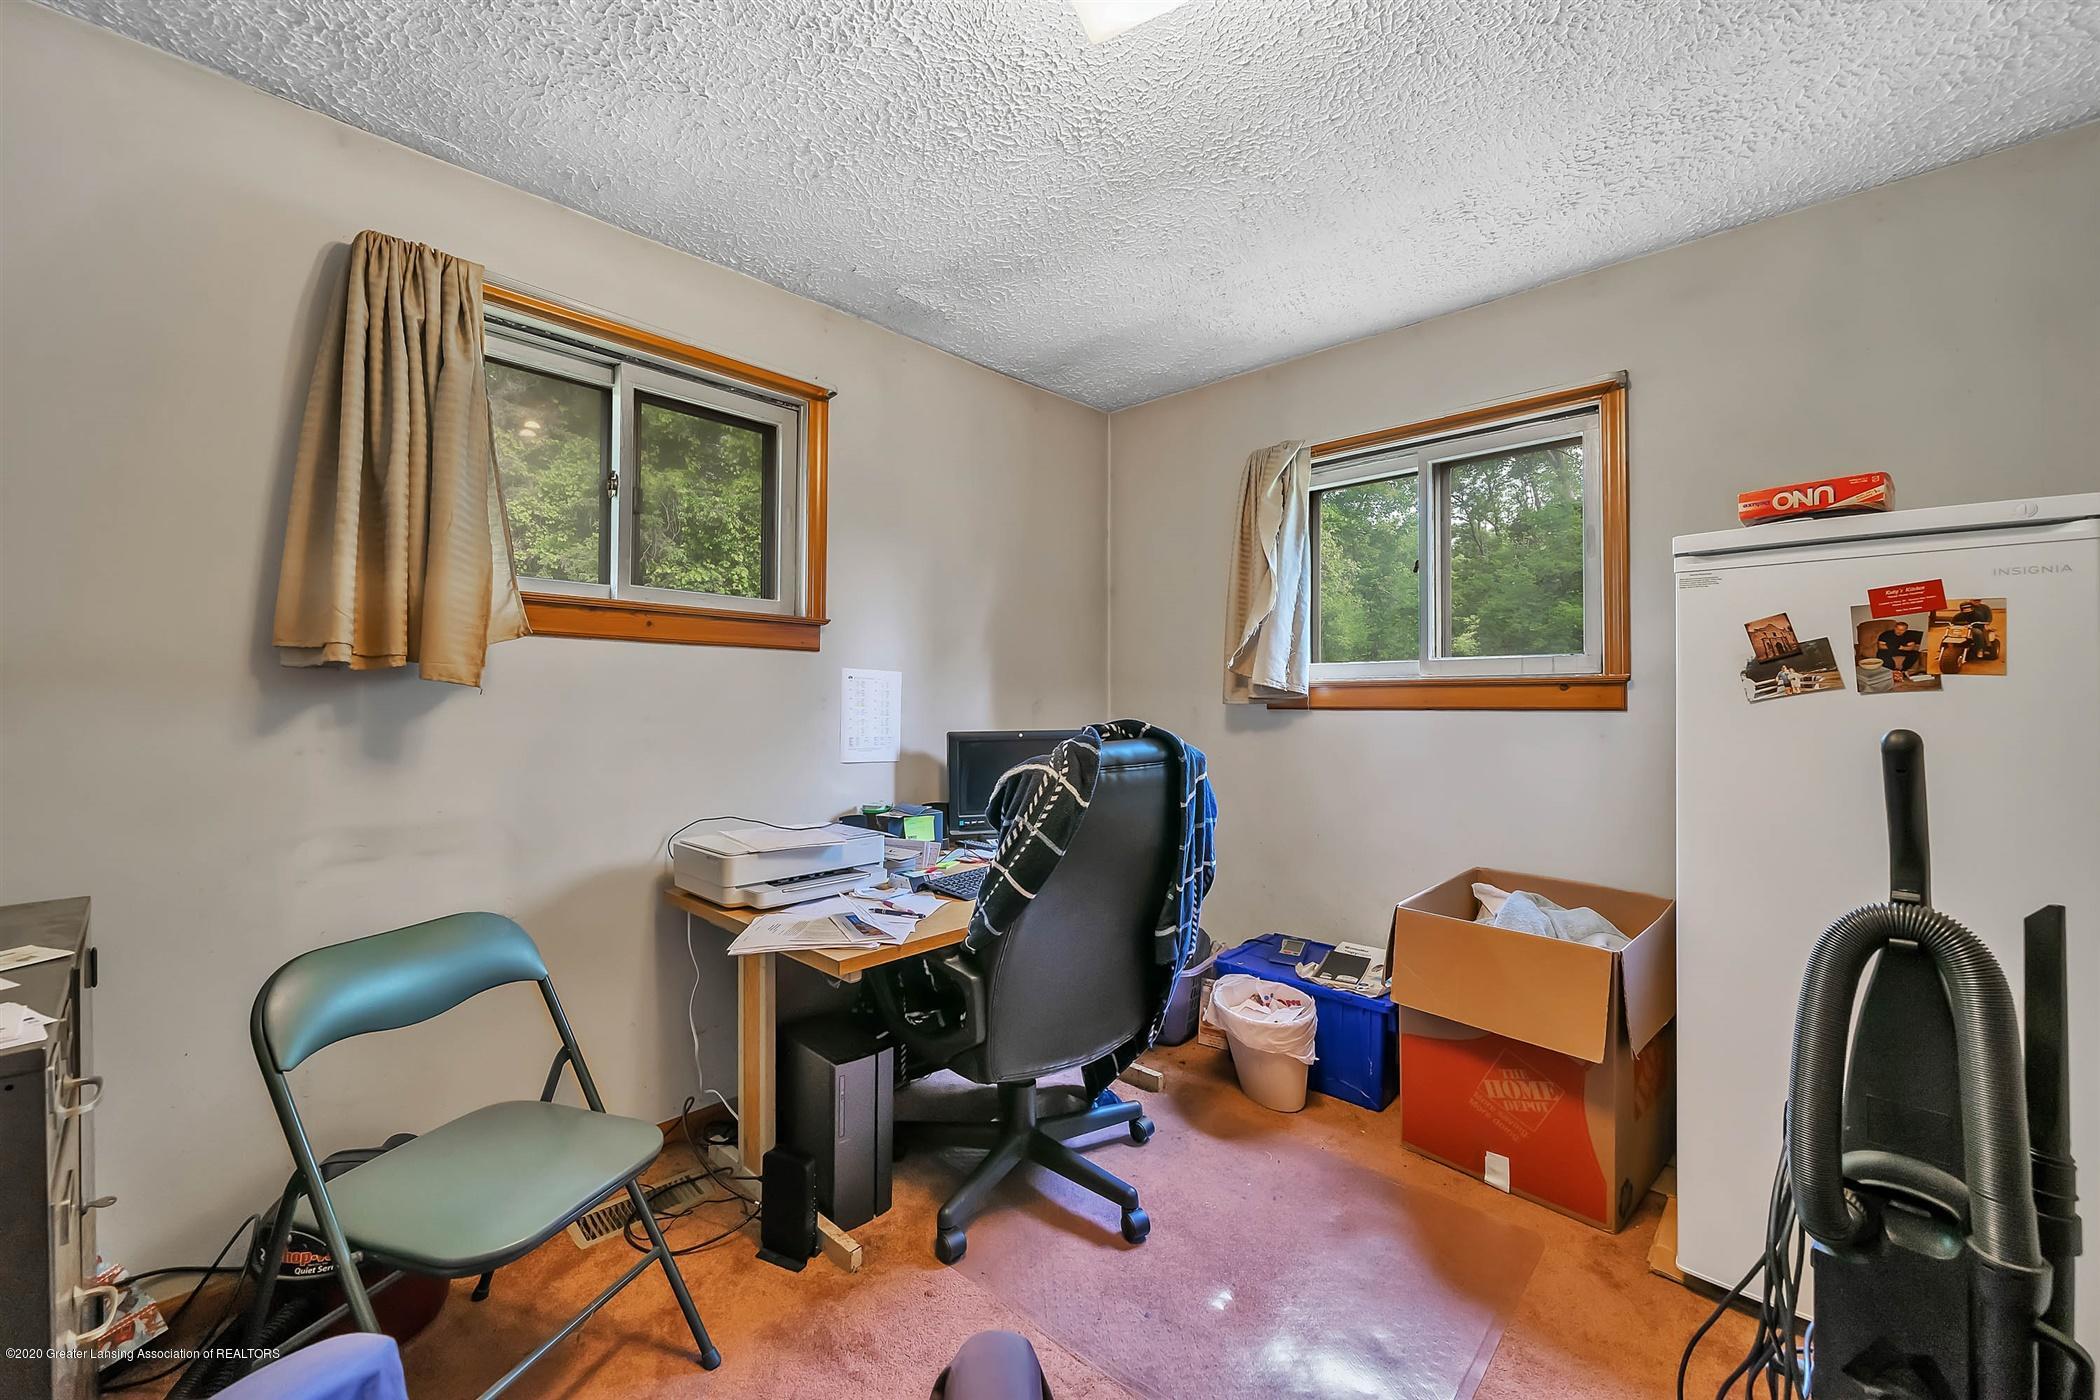 6750 W Lovejoy Rd - (41) 6758 Lovejoy Bedroom 2 - 41